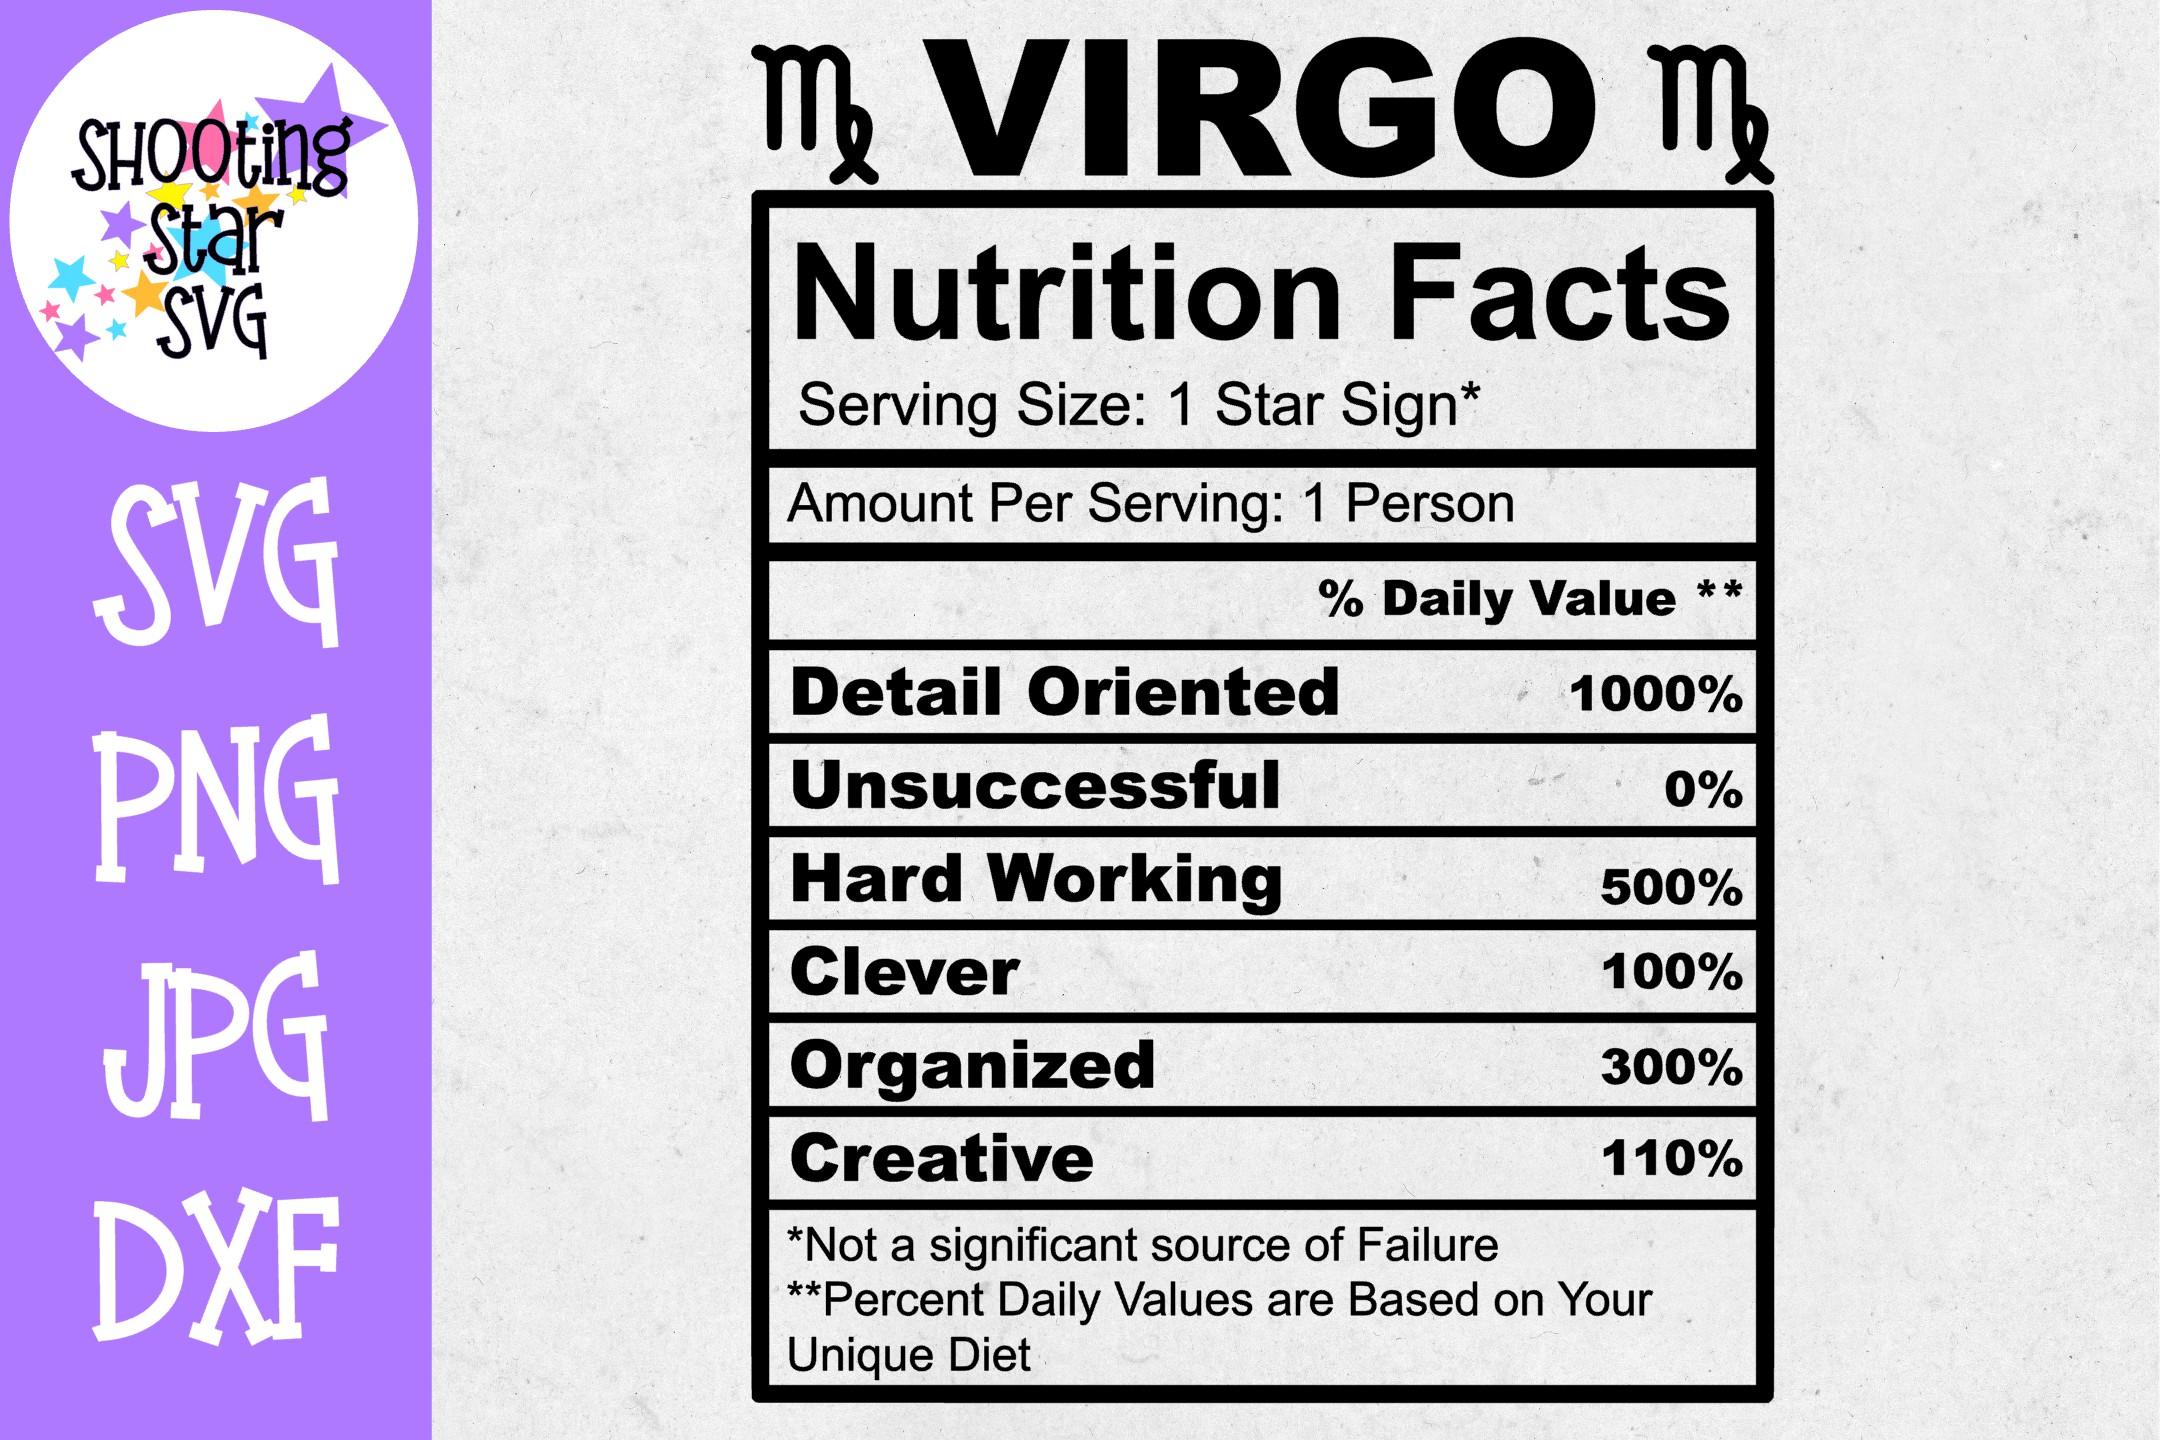 Virgo Zodiac Sign Nutrition Facts SVG - Virgo SVG example image 1